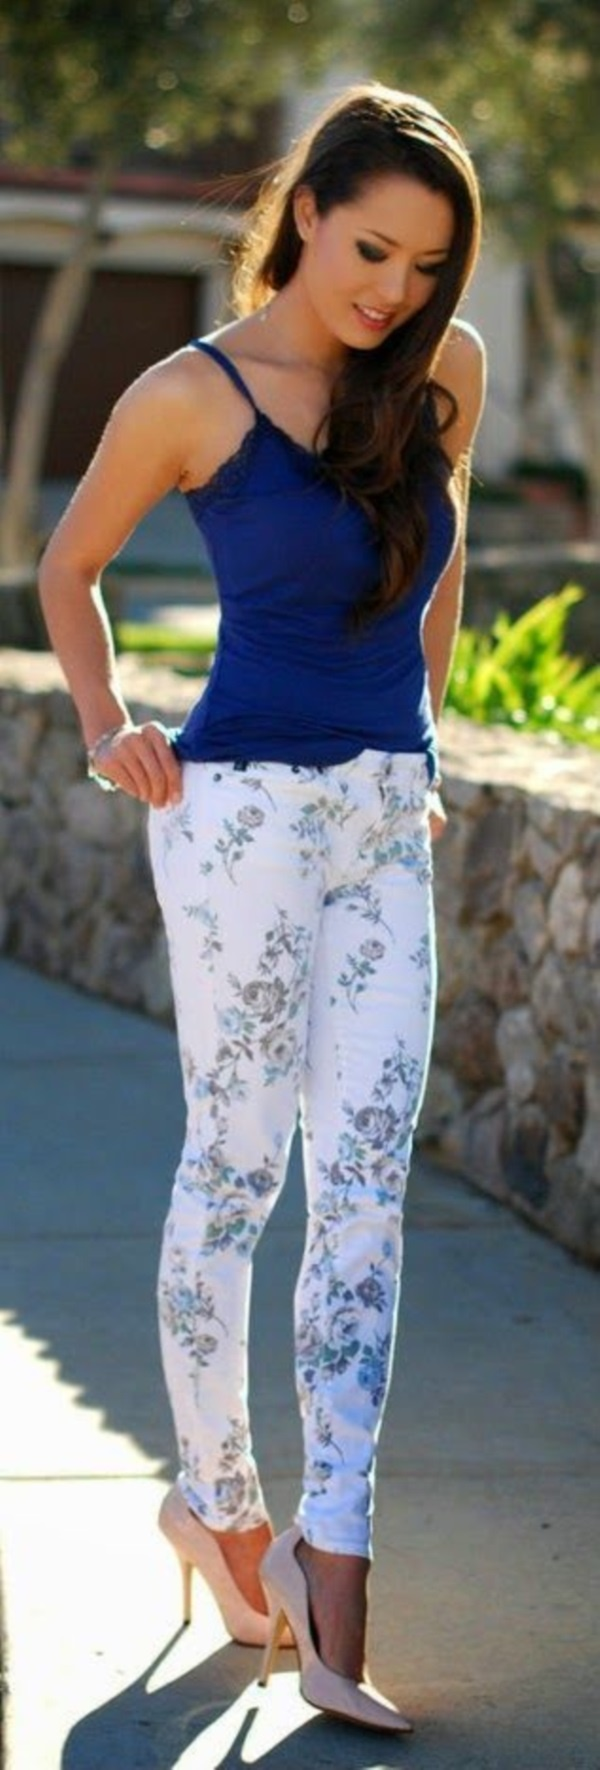 black floral pants outfits (54)